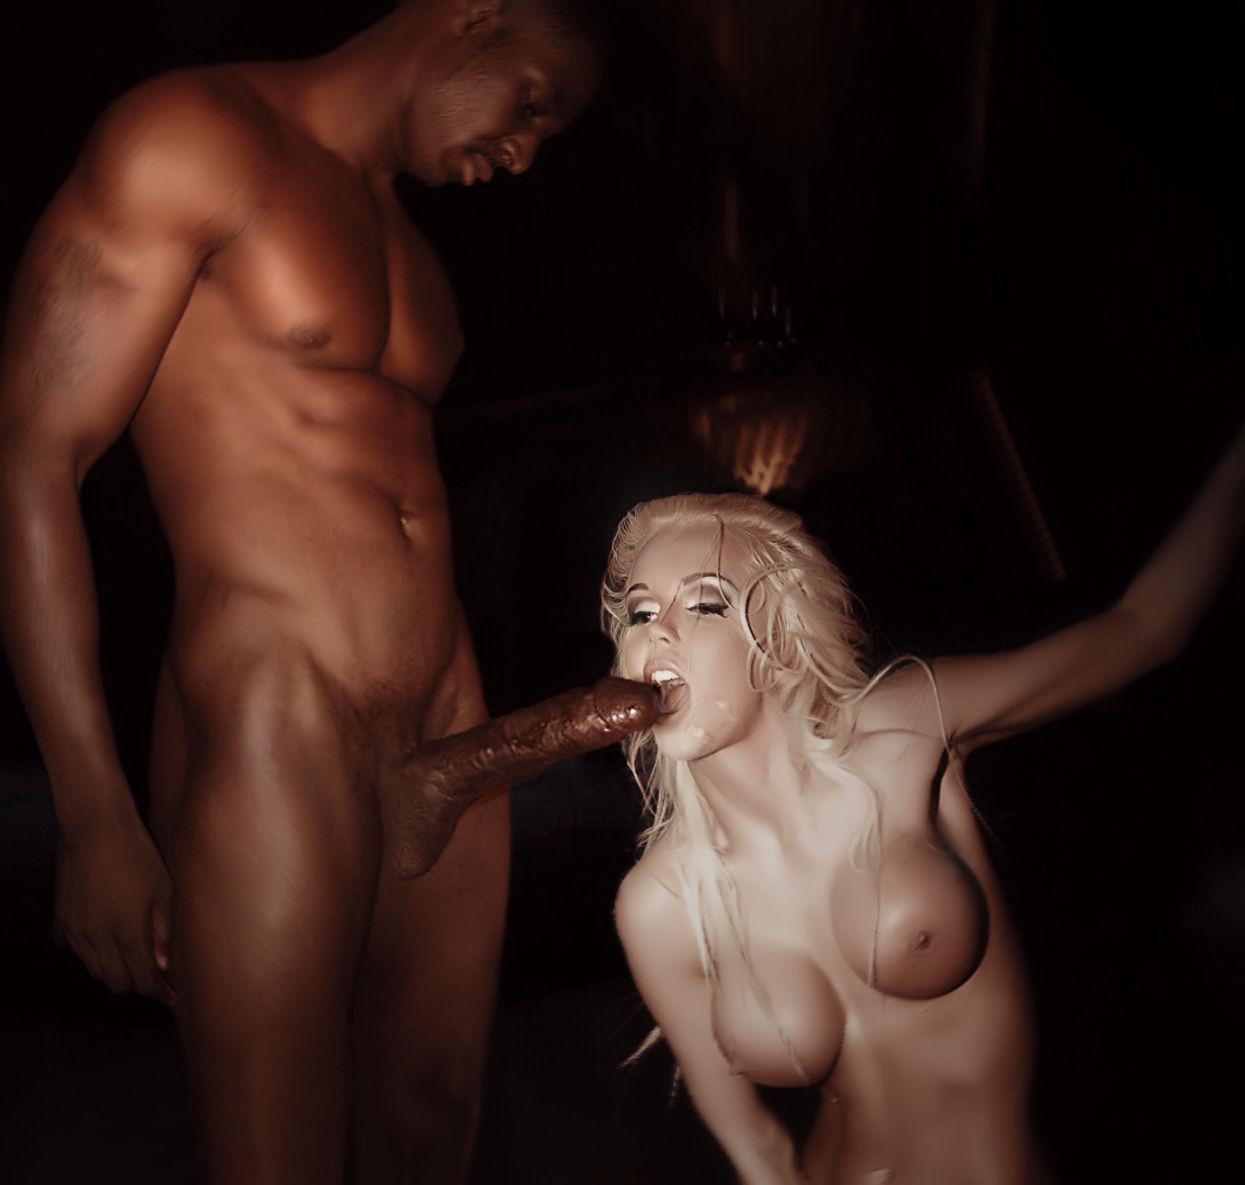 Обнаженная Катя Порно